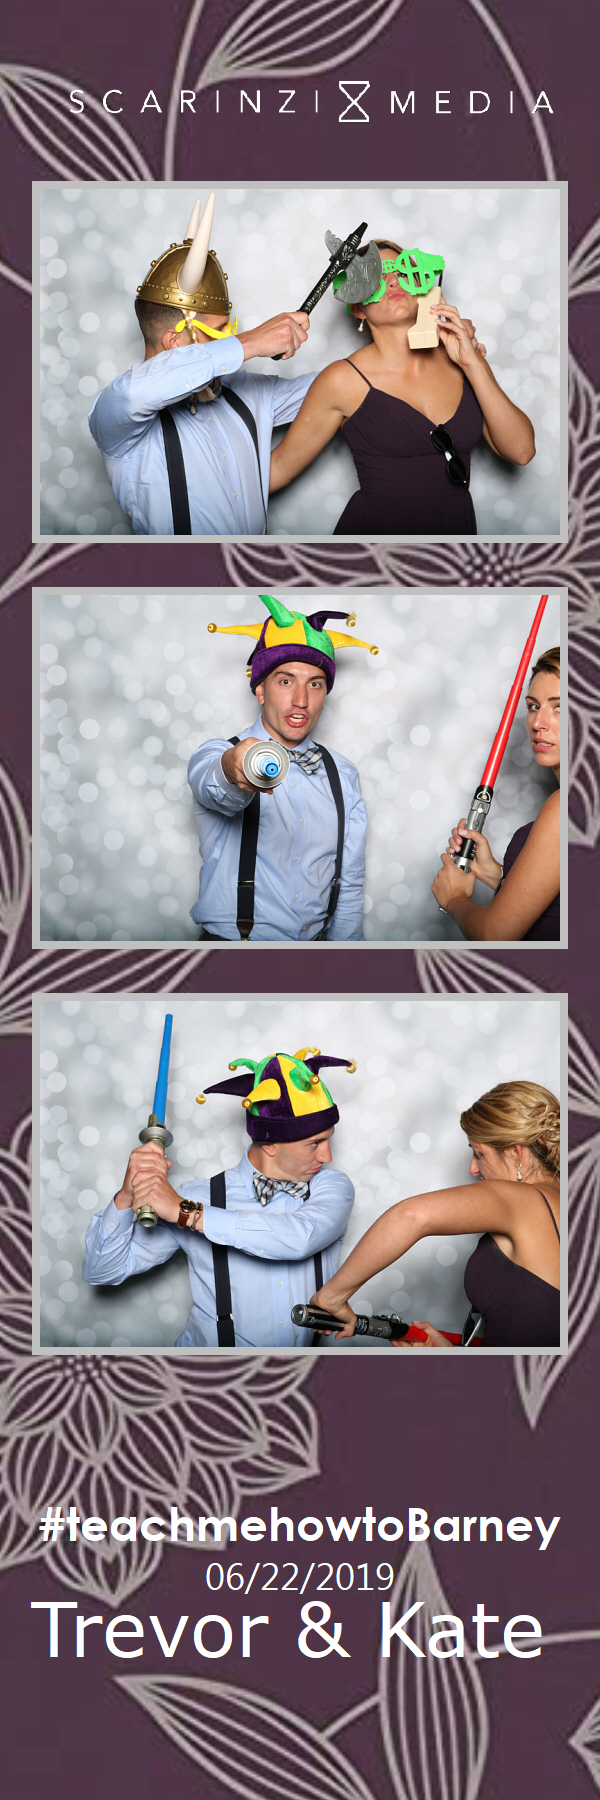 2019.06.22 - Barney Wedding PHOTOBOOTH37.jpg